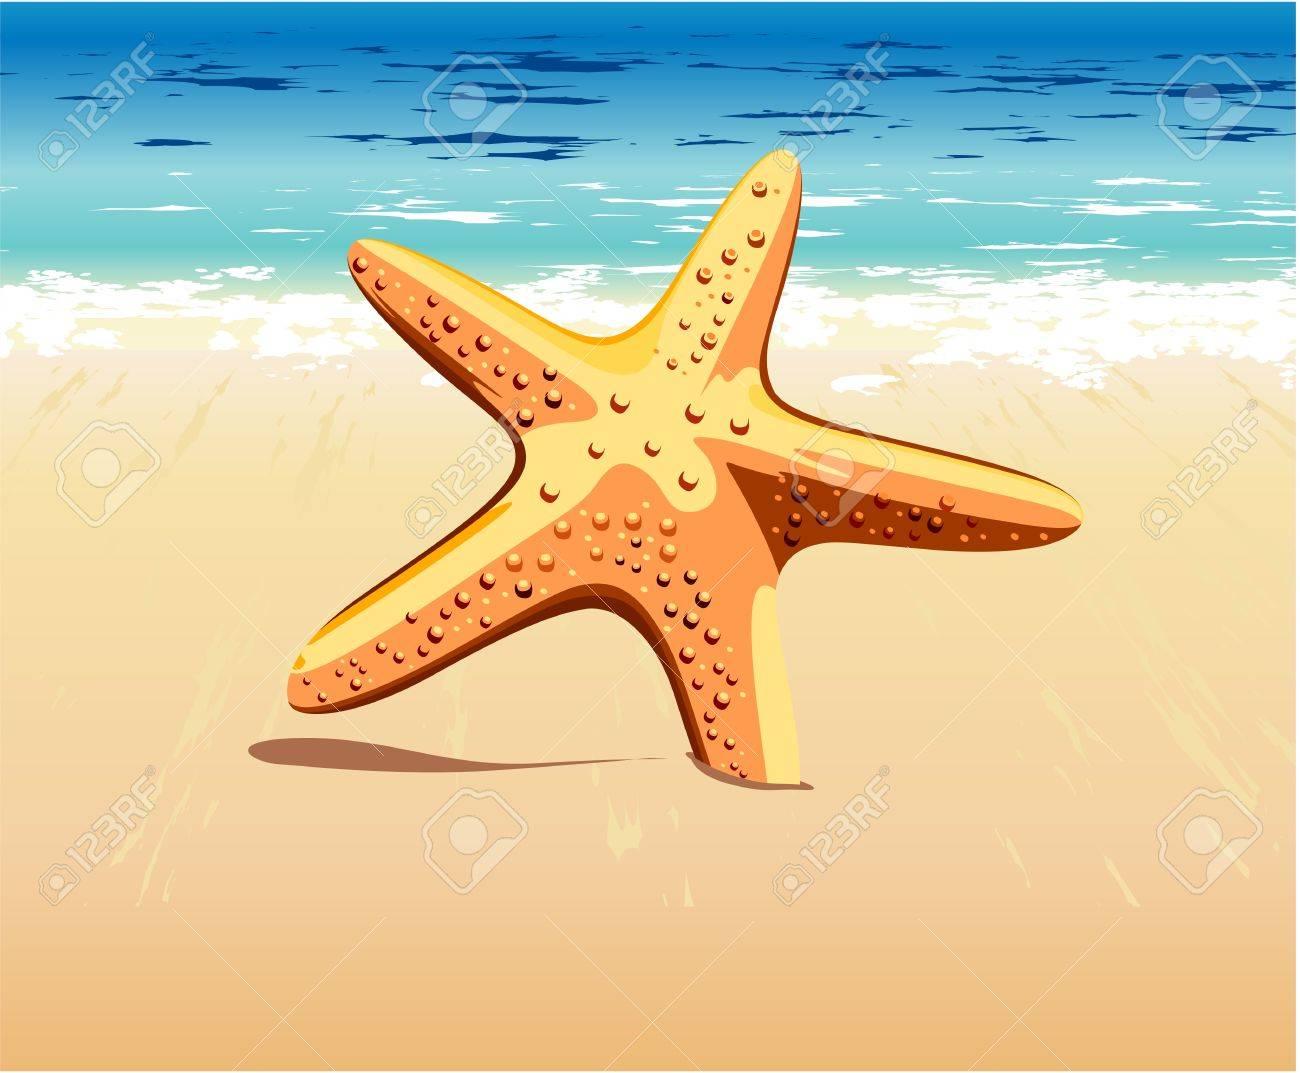 starfish stuck in the sand near the sea Stock Vector - 13920658